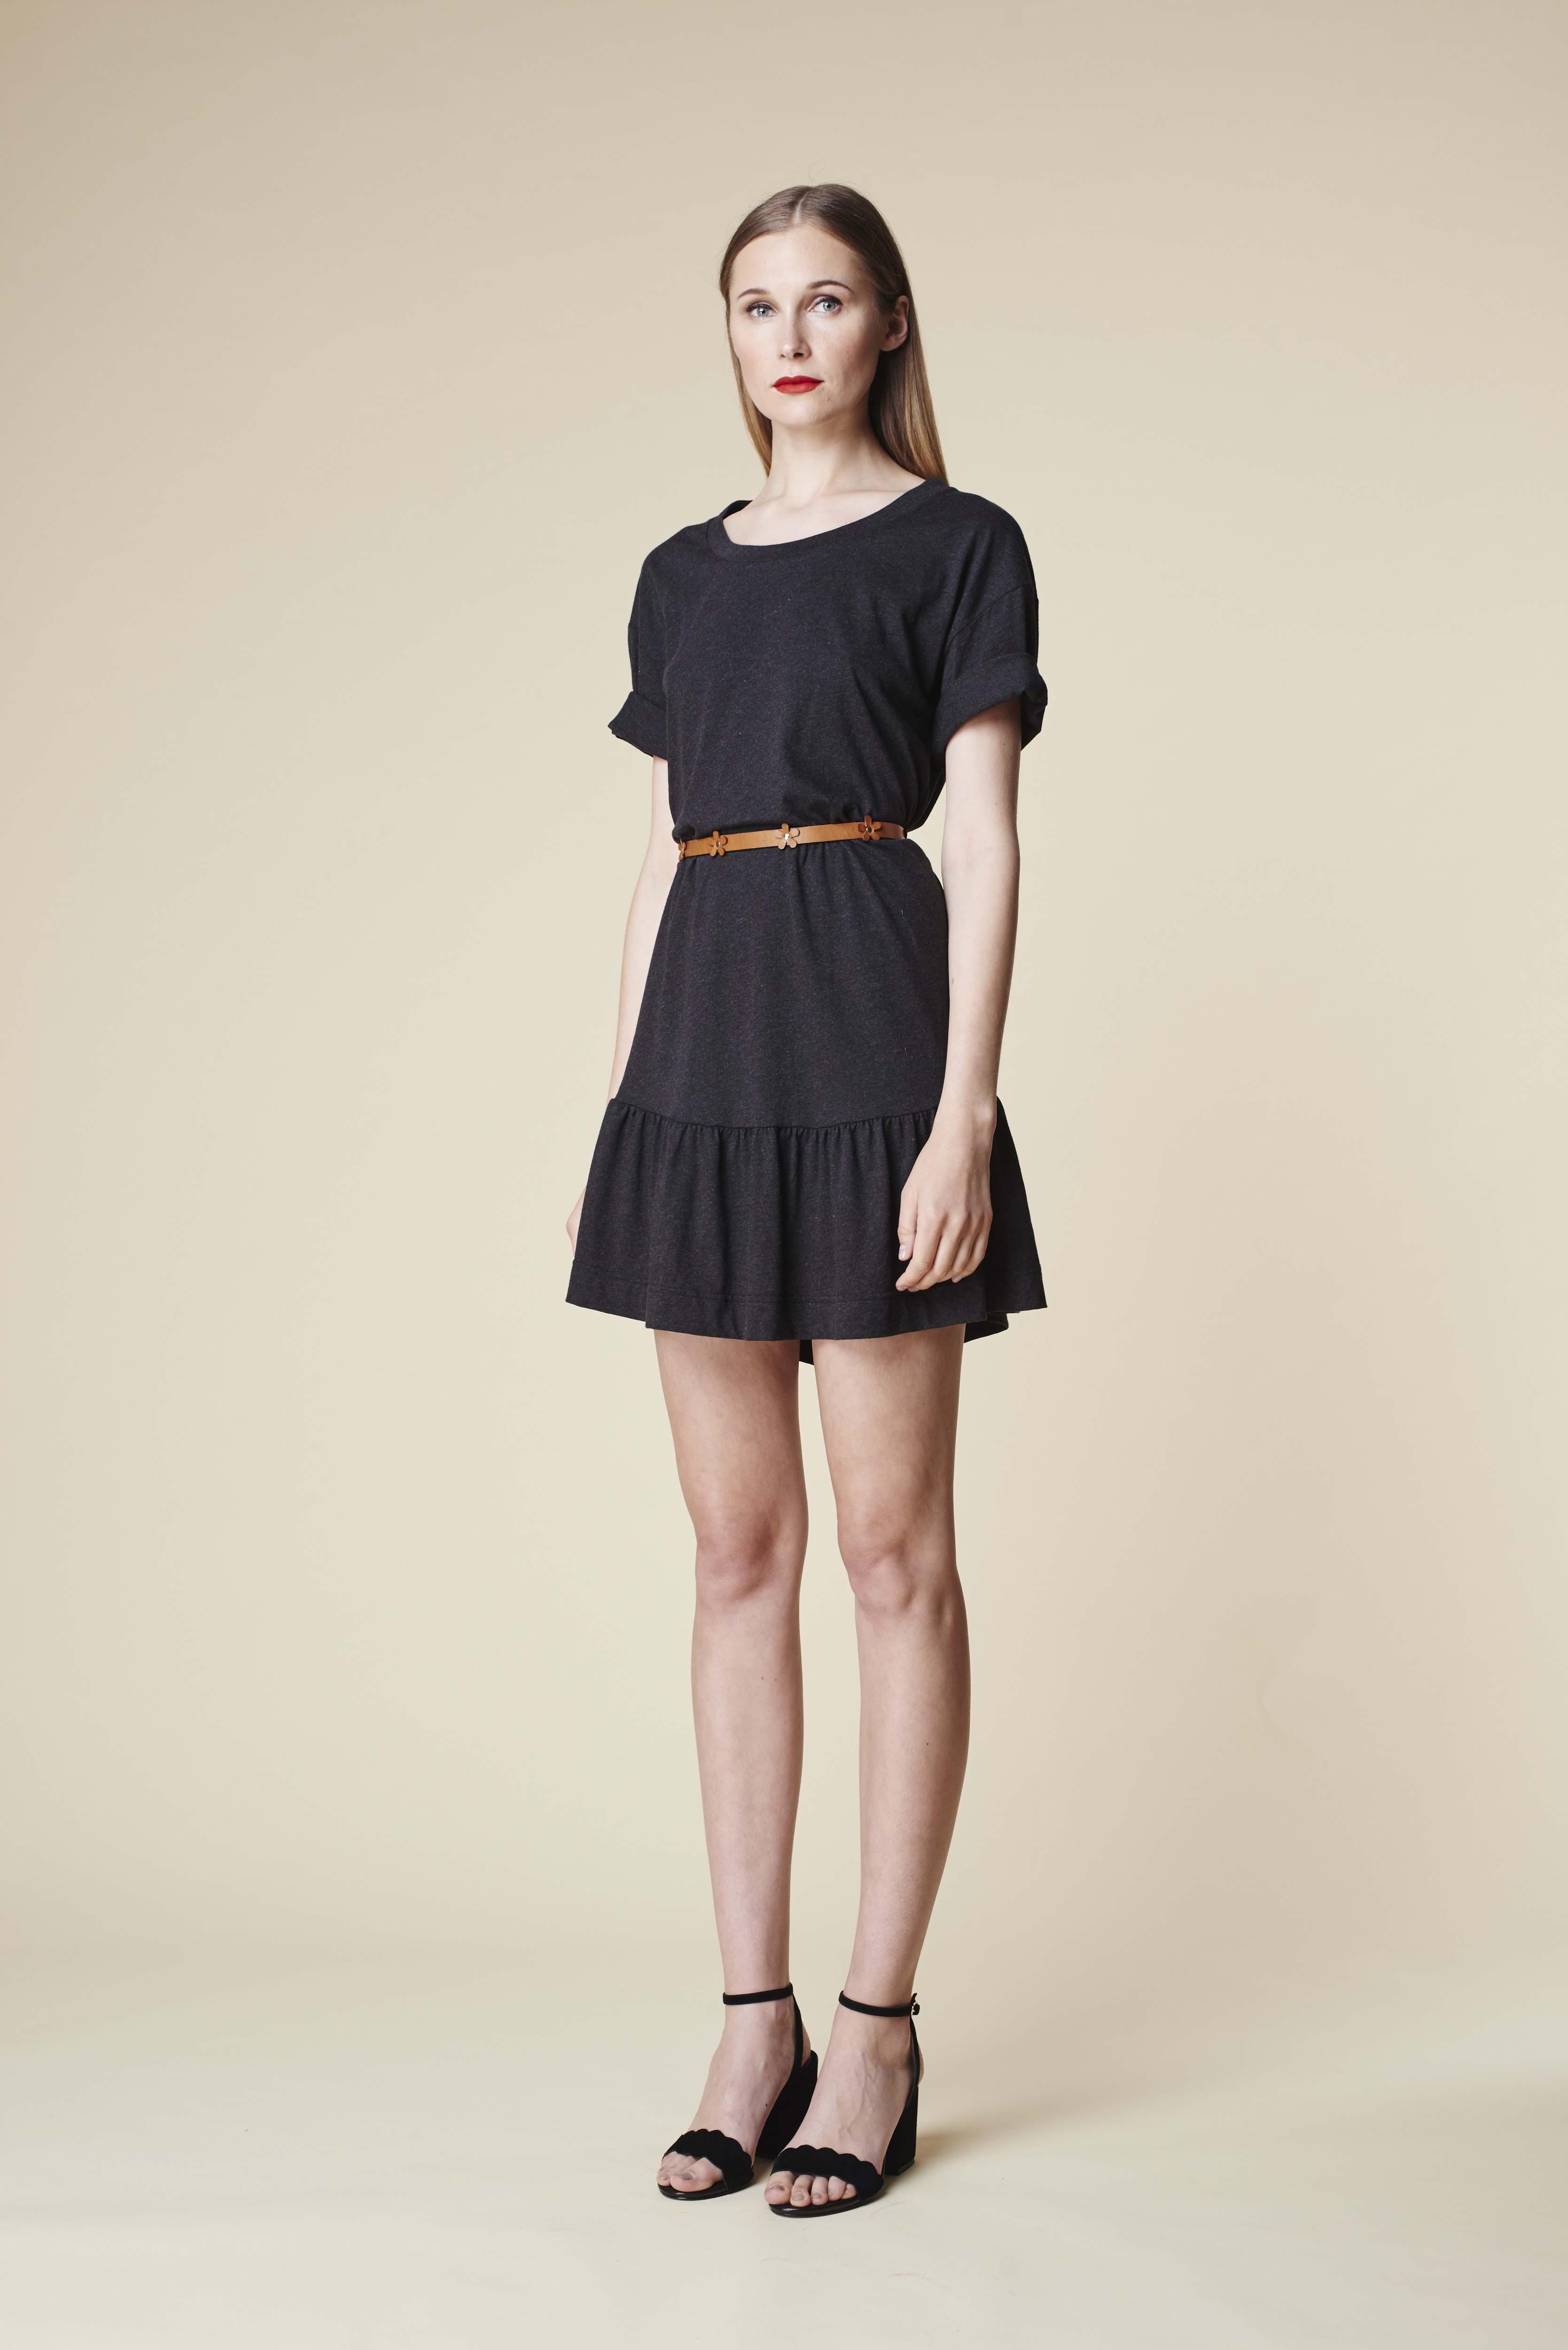 RUBY Zora T-Shirt Dress & Lila Heel